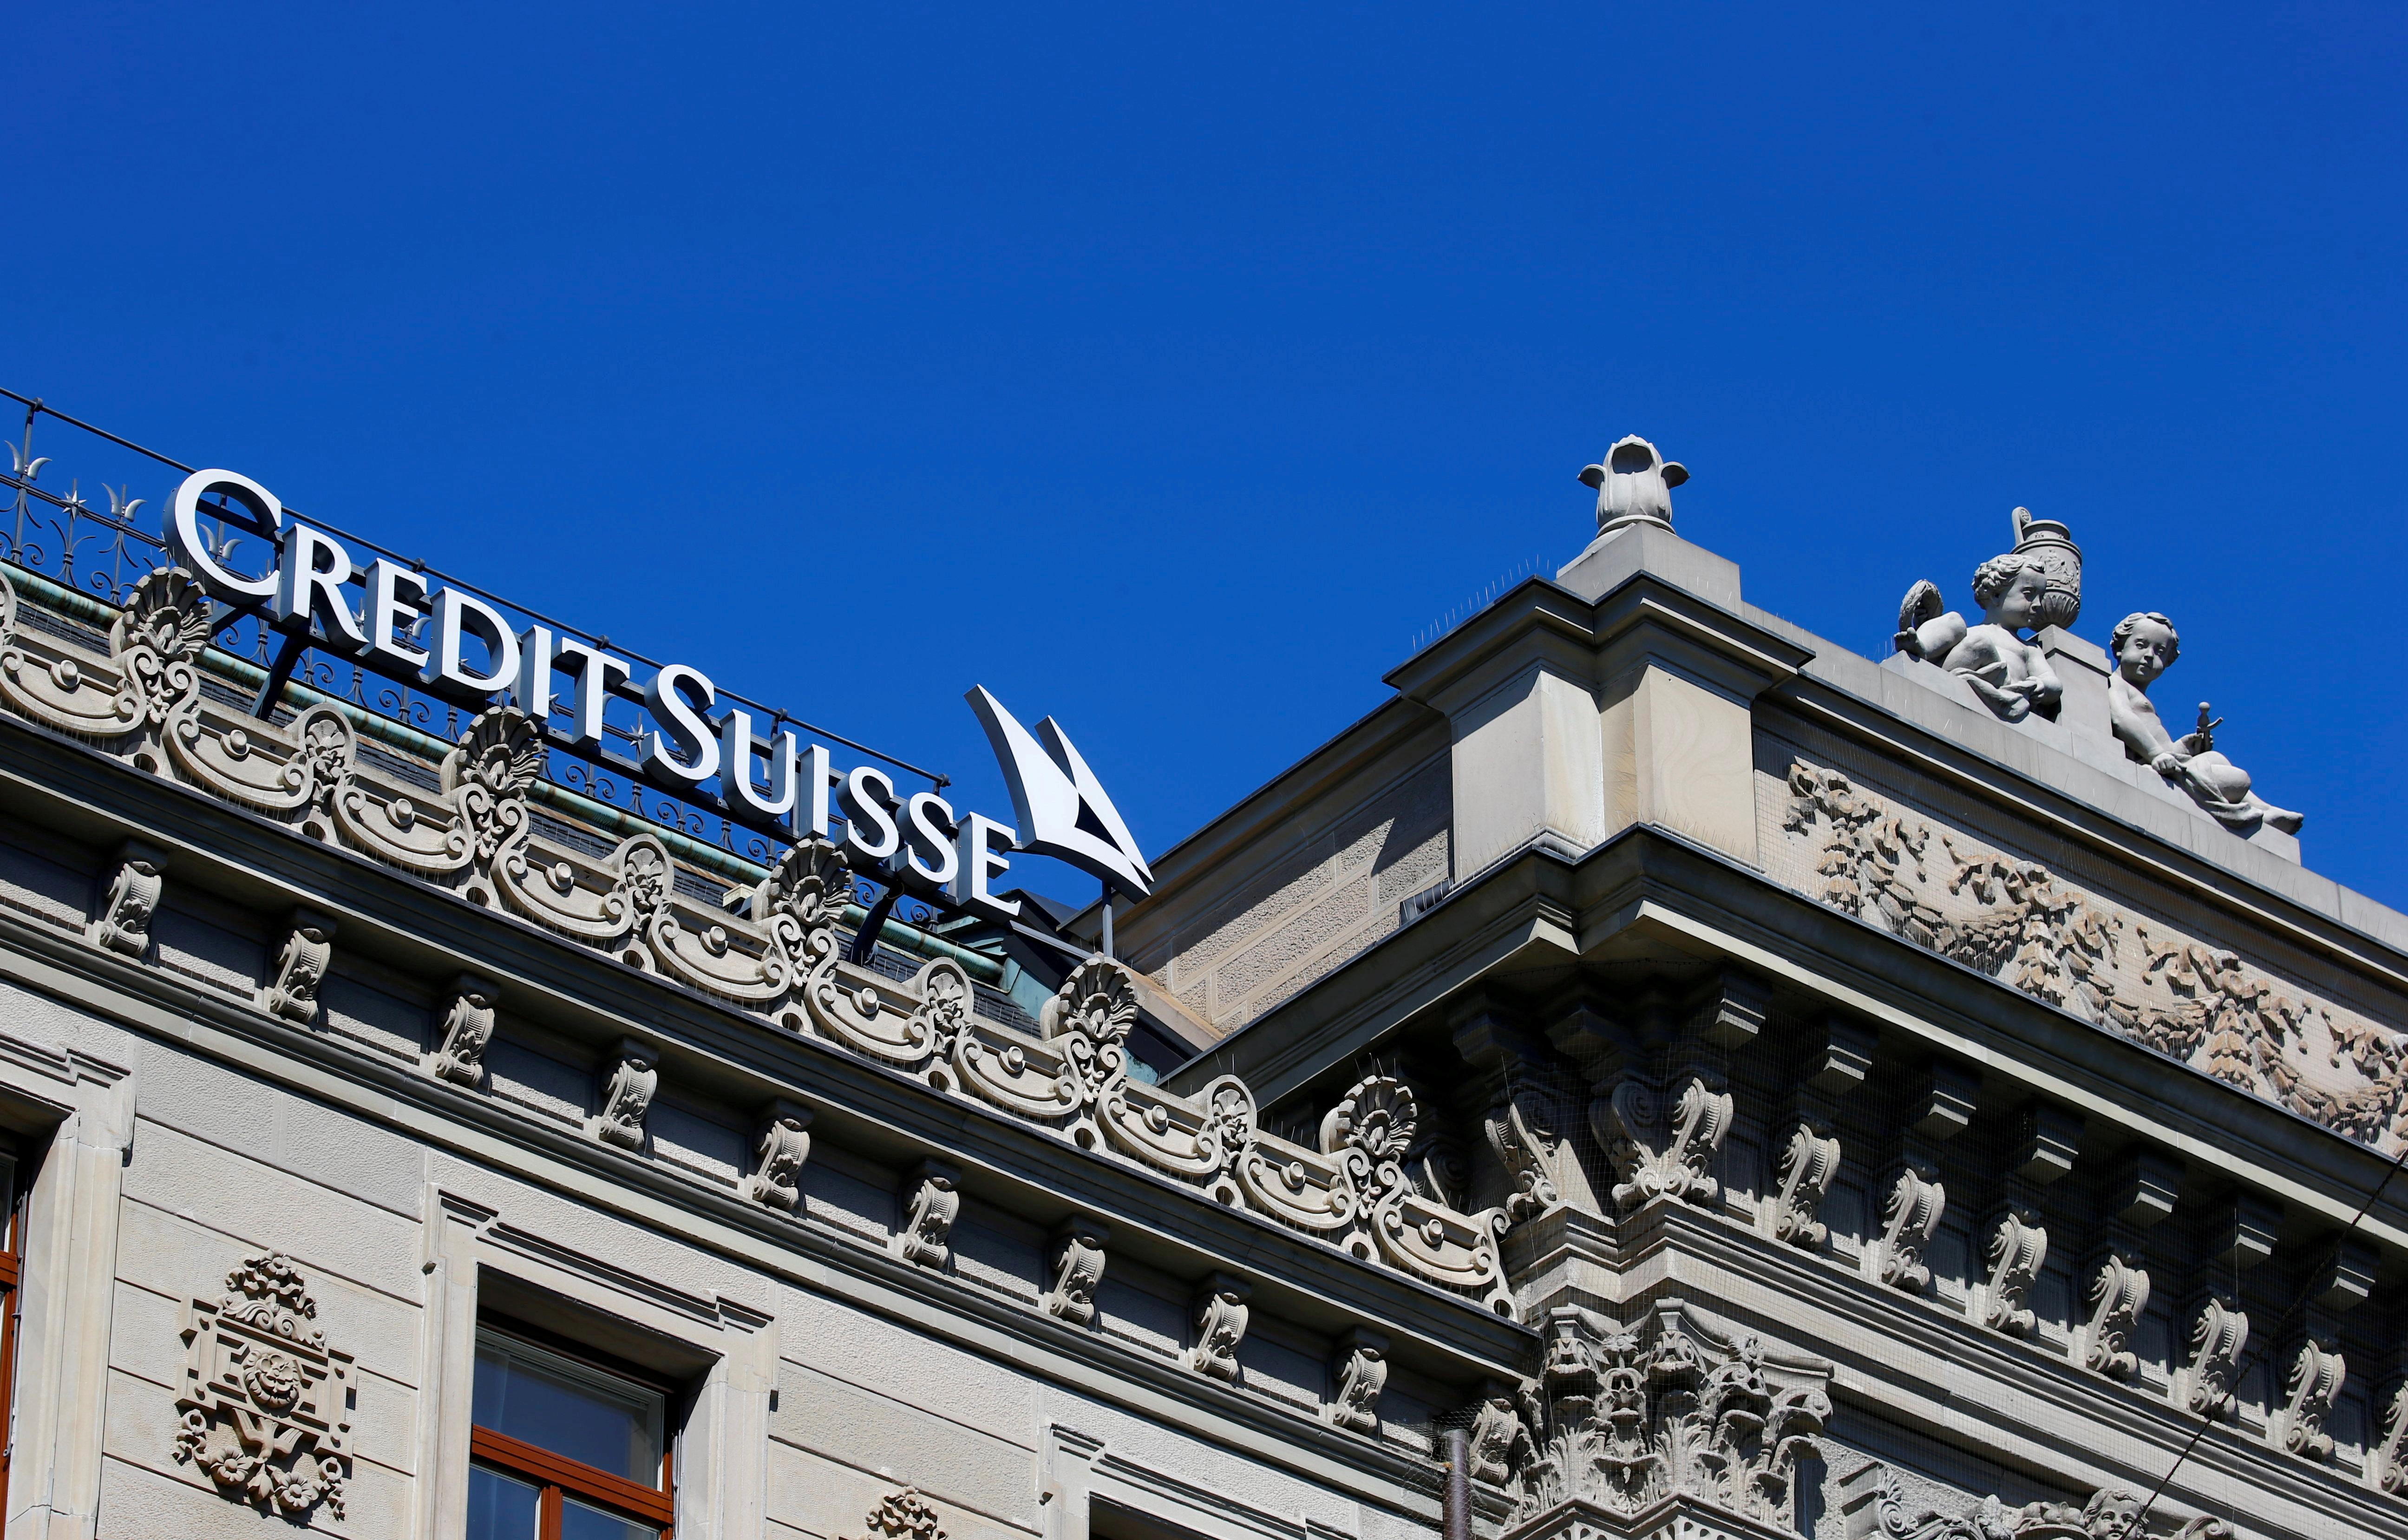 The logo of Swiss bank Credit Suisse is seen at its headquarters in Zurich, Switzerland March 24, 2021.   REUTERS/Arnd Wiegmann